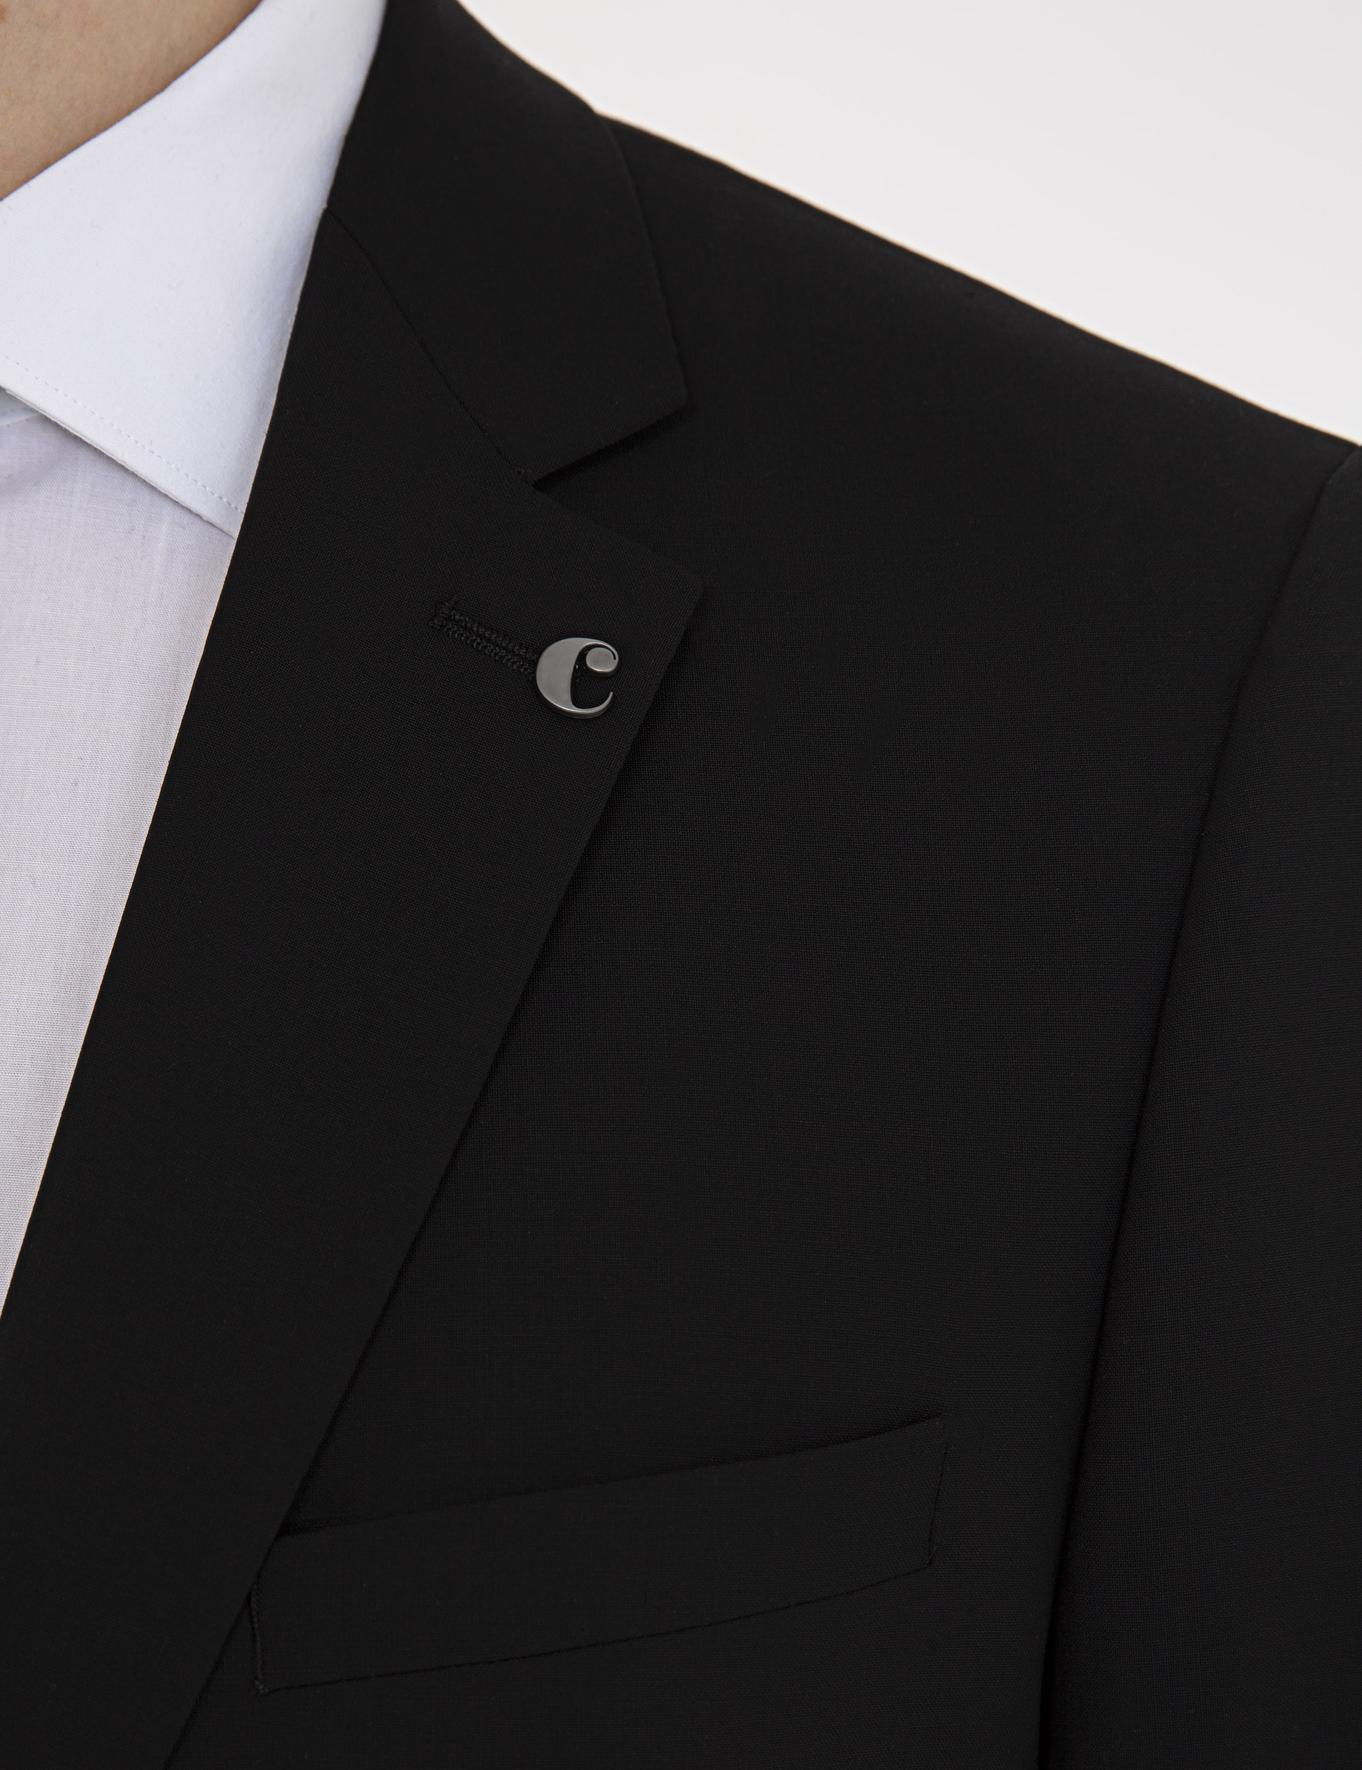 Siyah Slim Fit Ceket - 50235695050